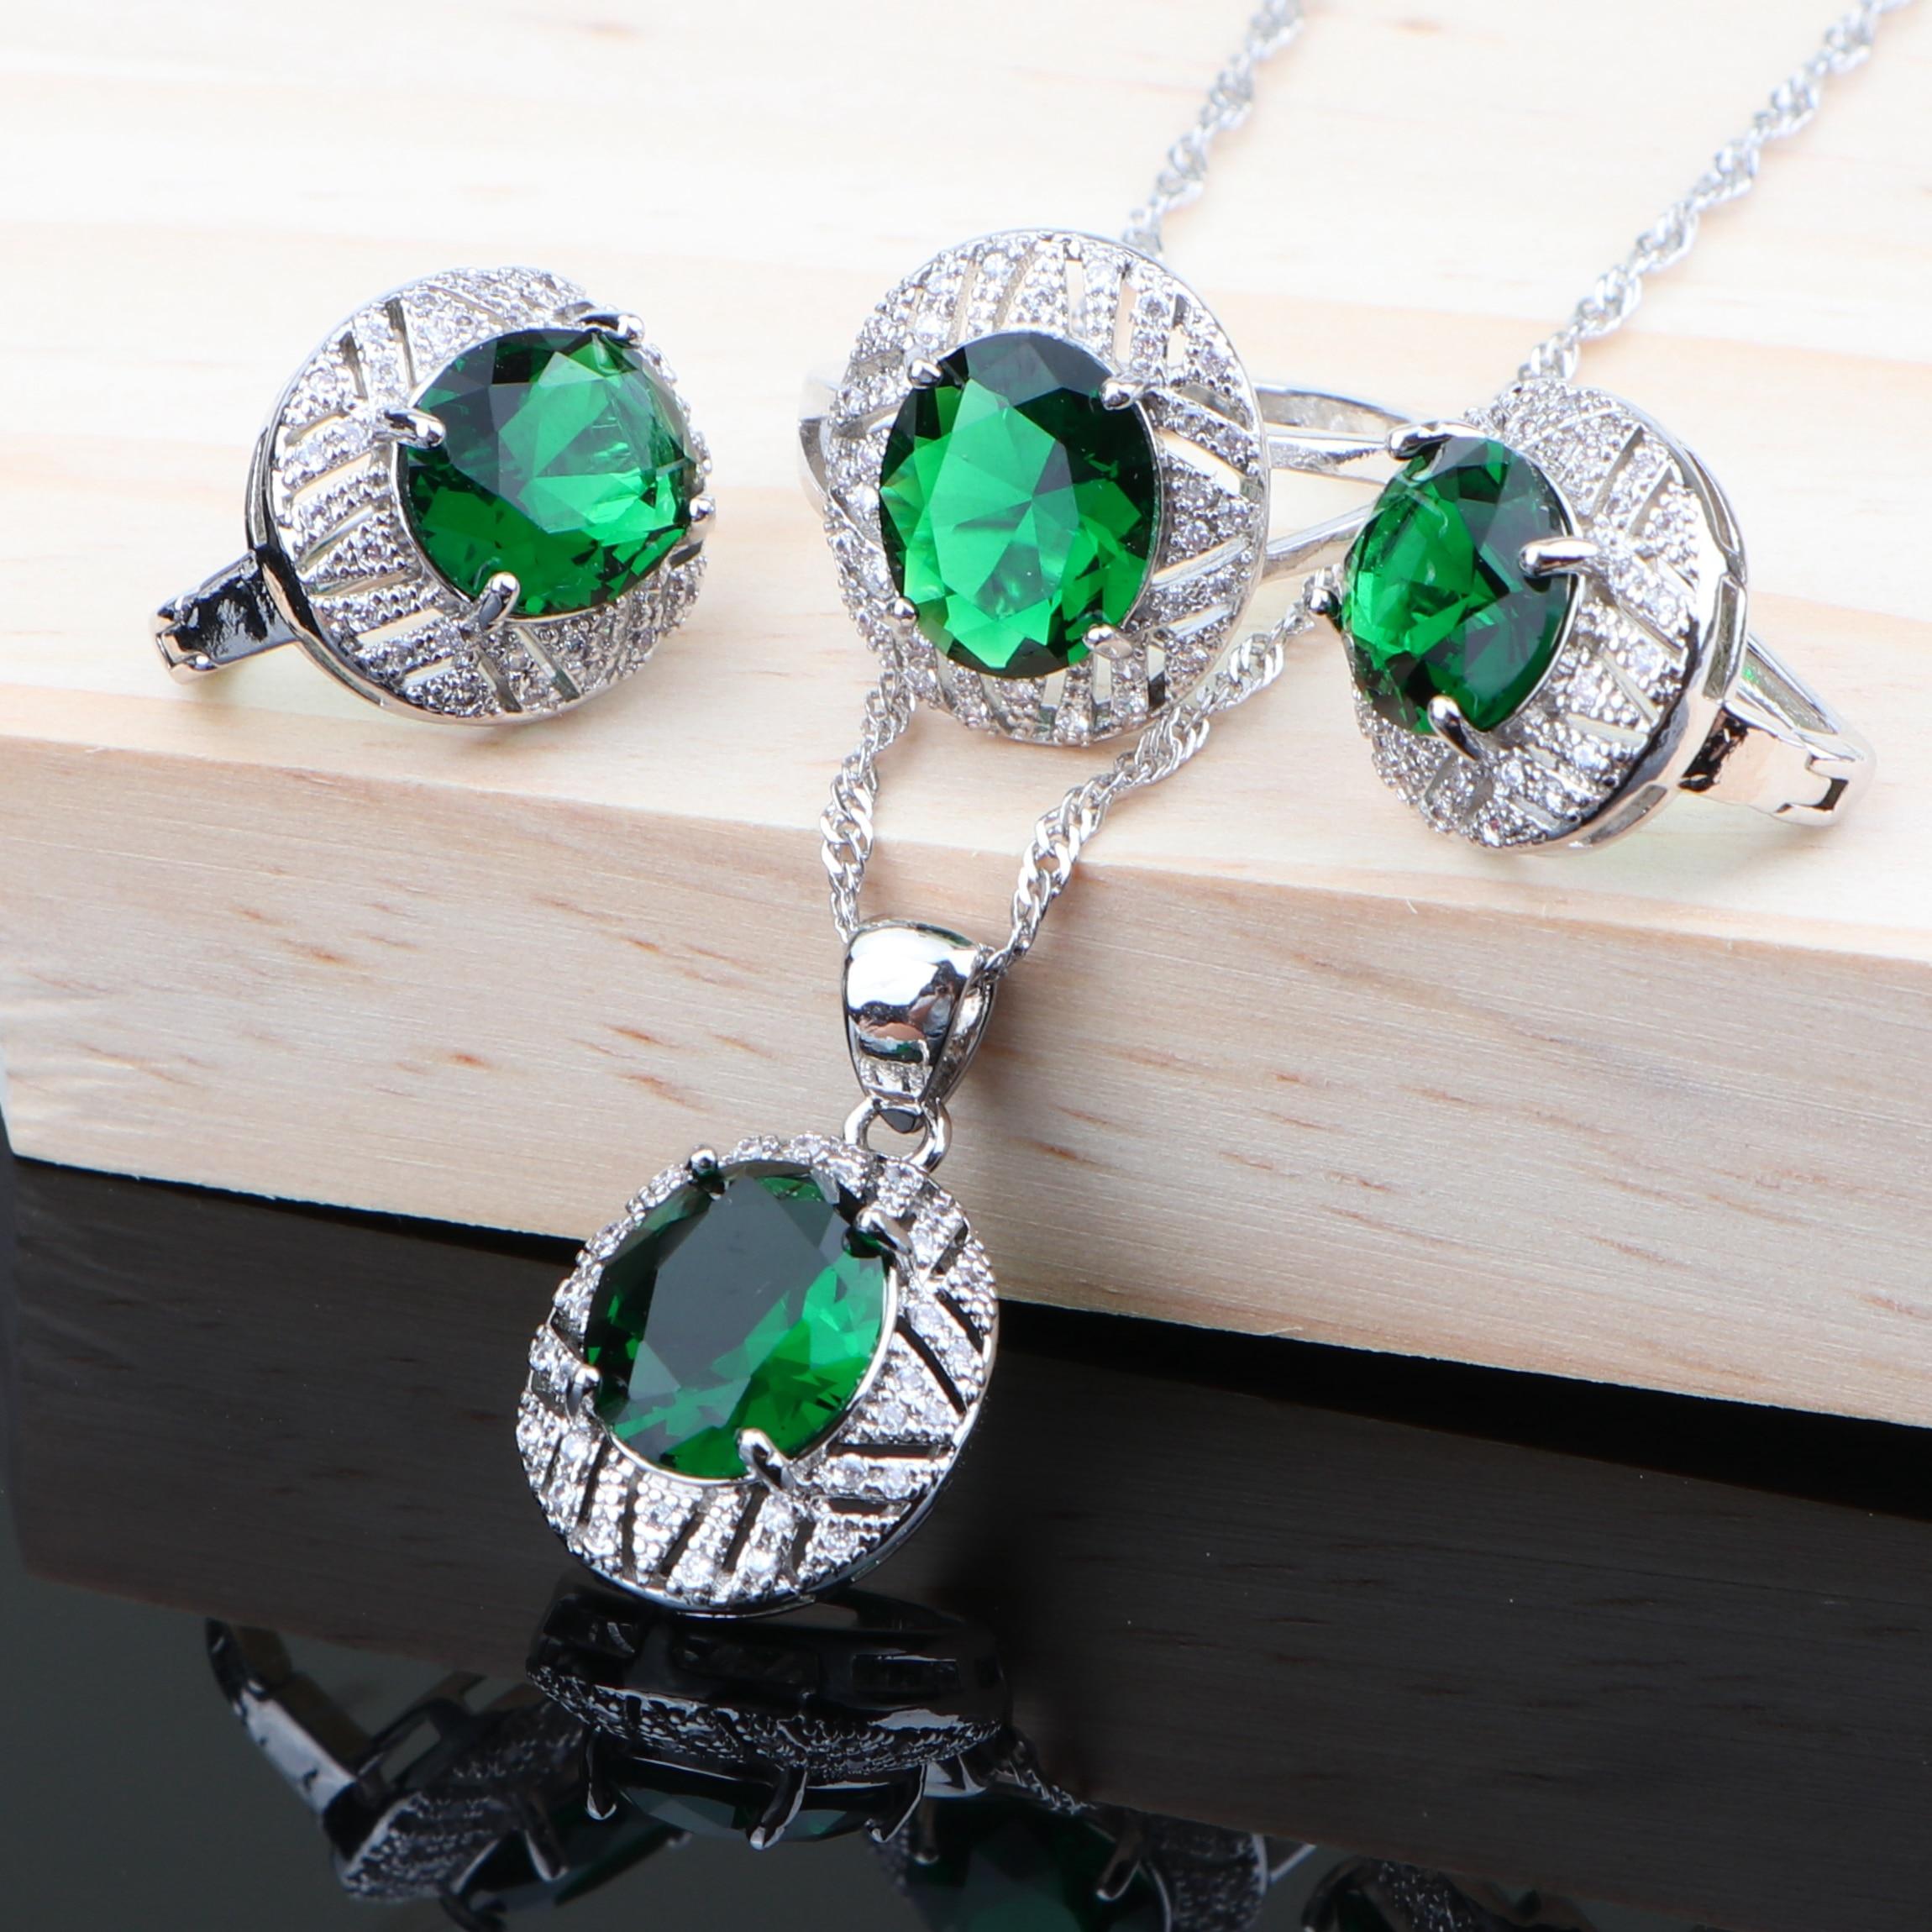 Earrings Necklace Pendant-Set Jewelry Rhinestone Zirconia-Ring Bridal-Girls Silver 925